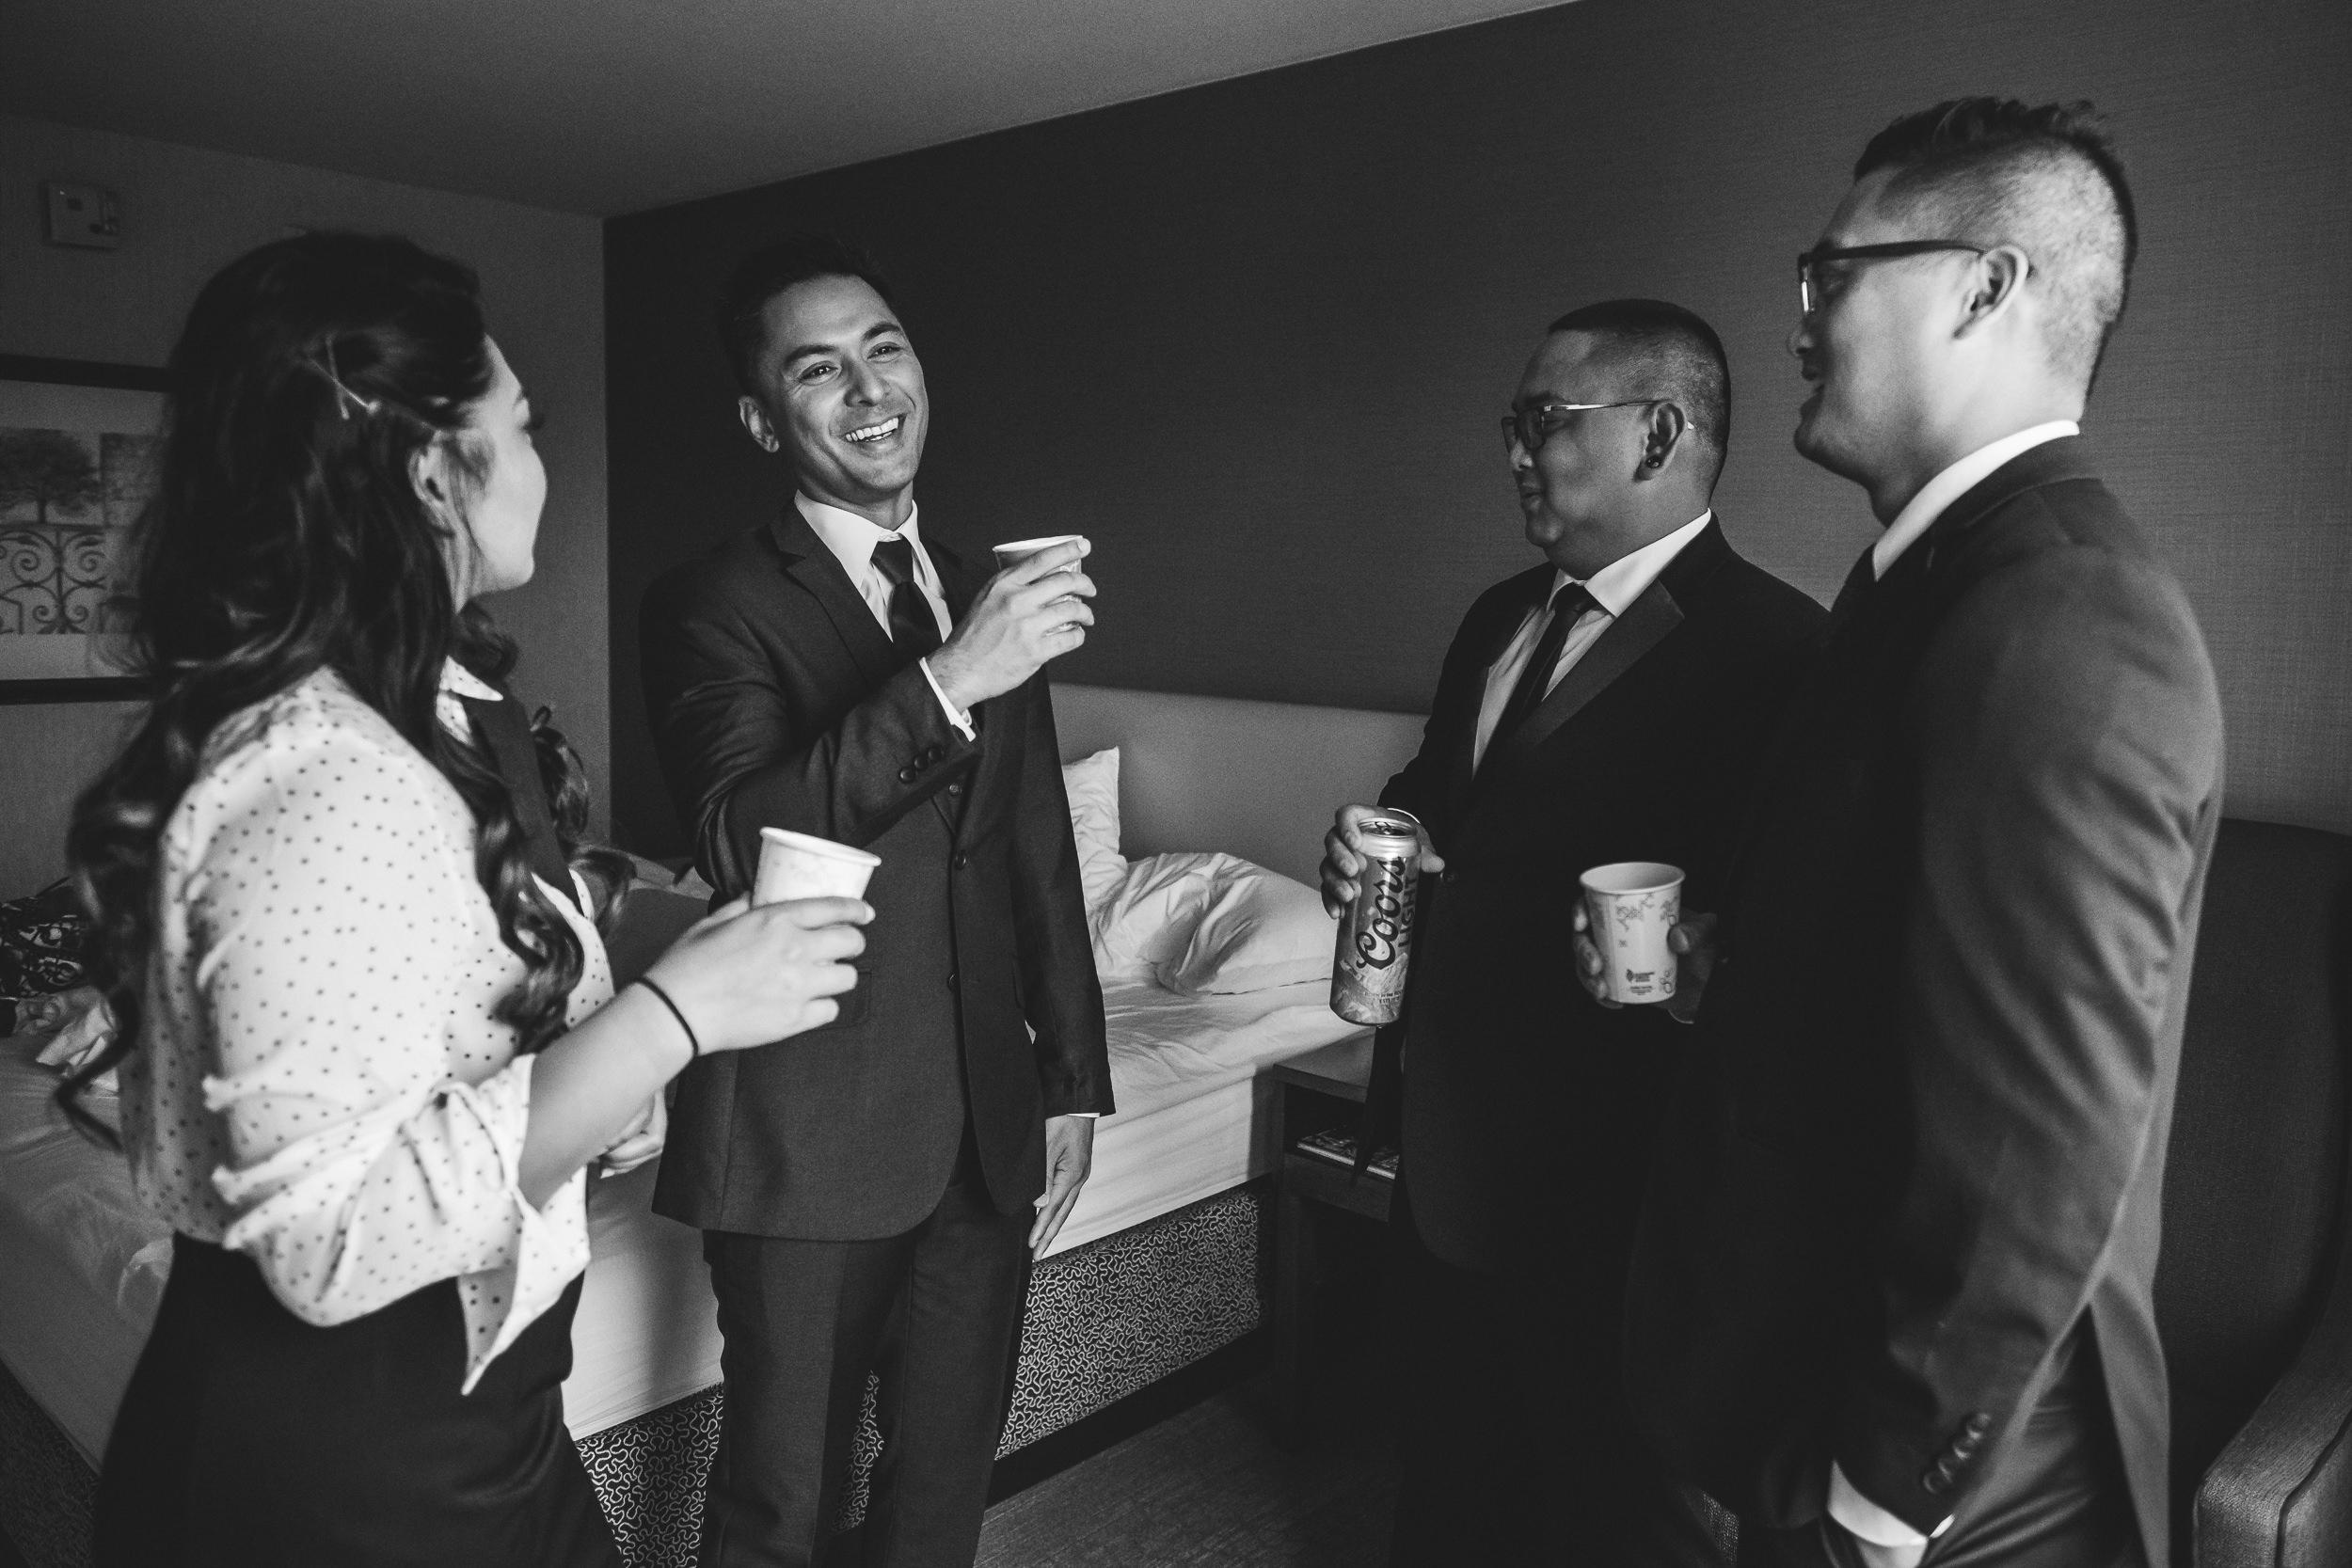 San-Francisco-City-Hall-Wedding-Photography-028.jpg